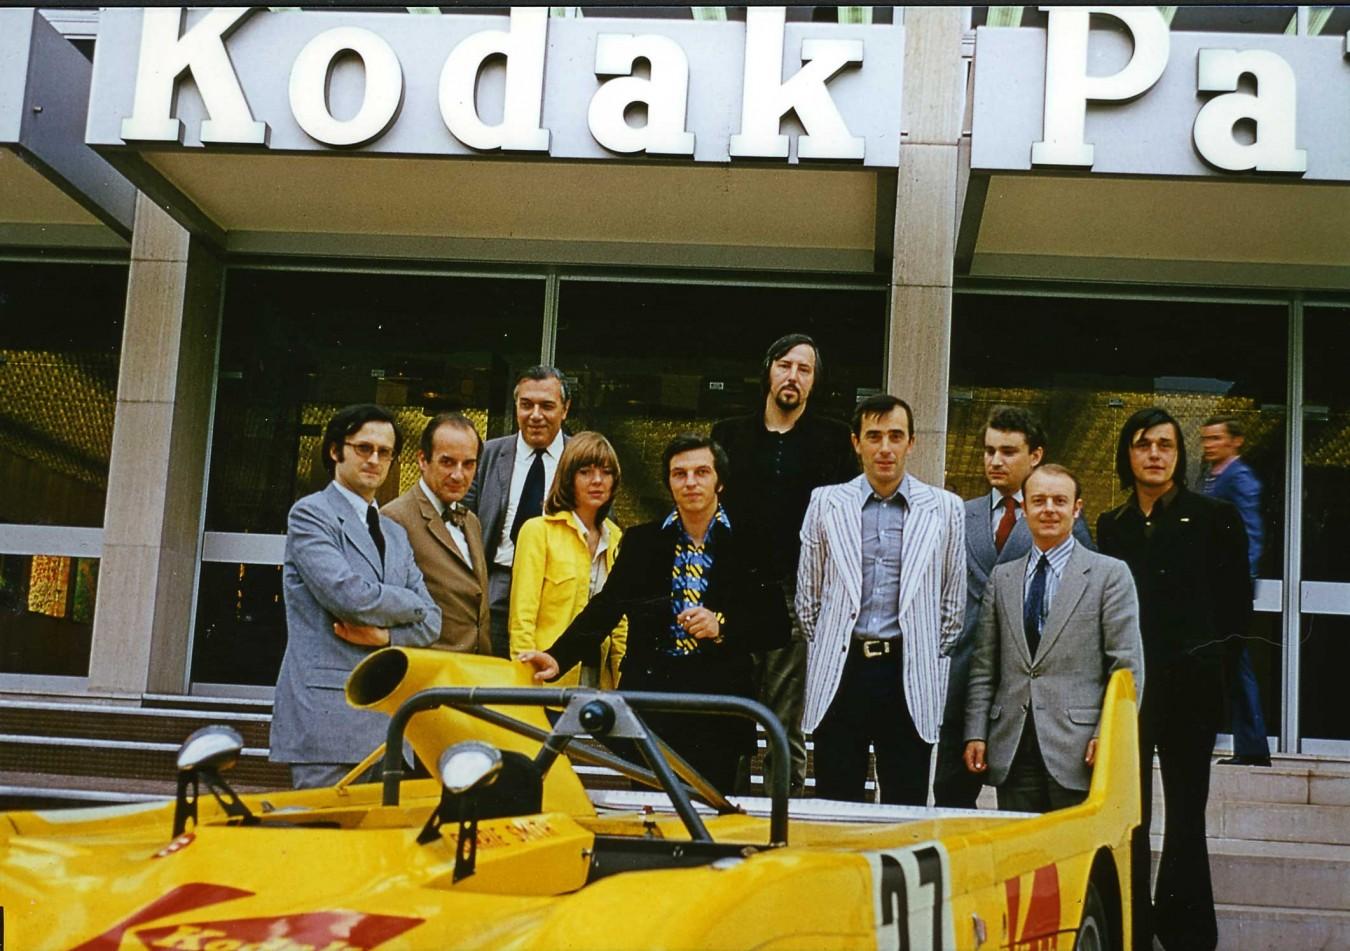 Kodak-Pathe-Ave-Mont